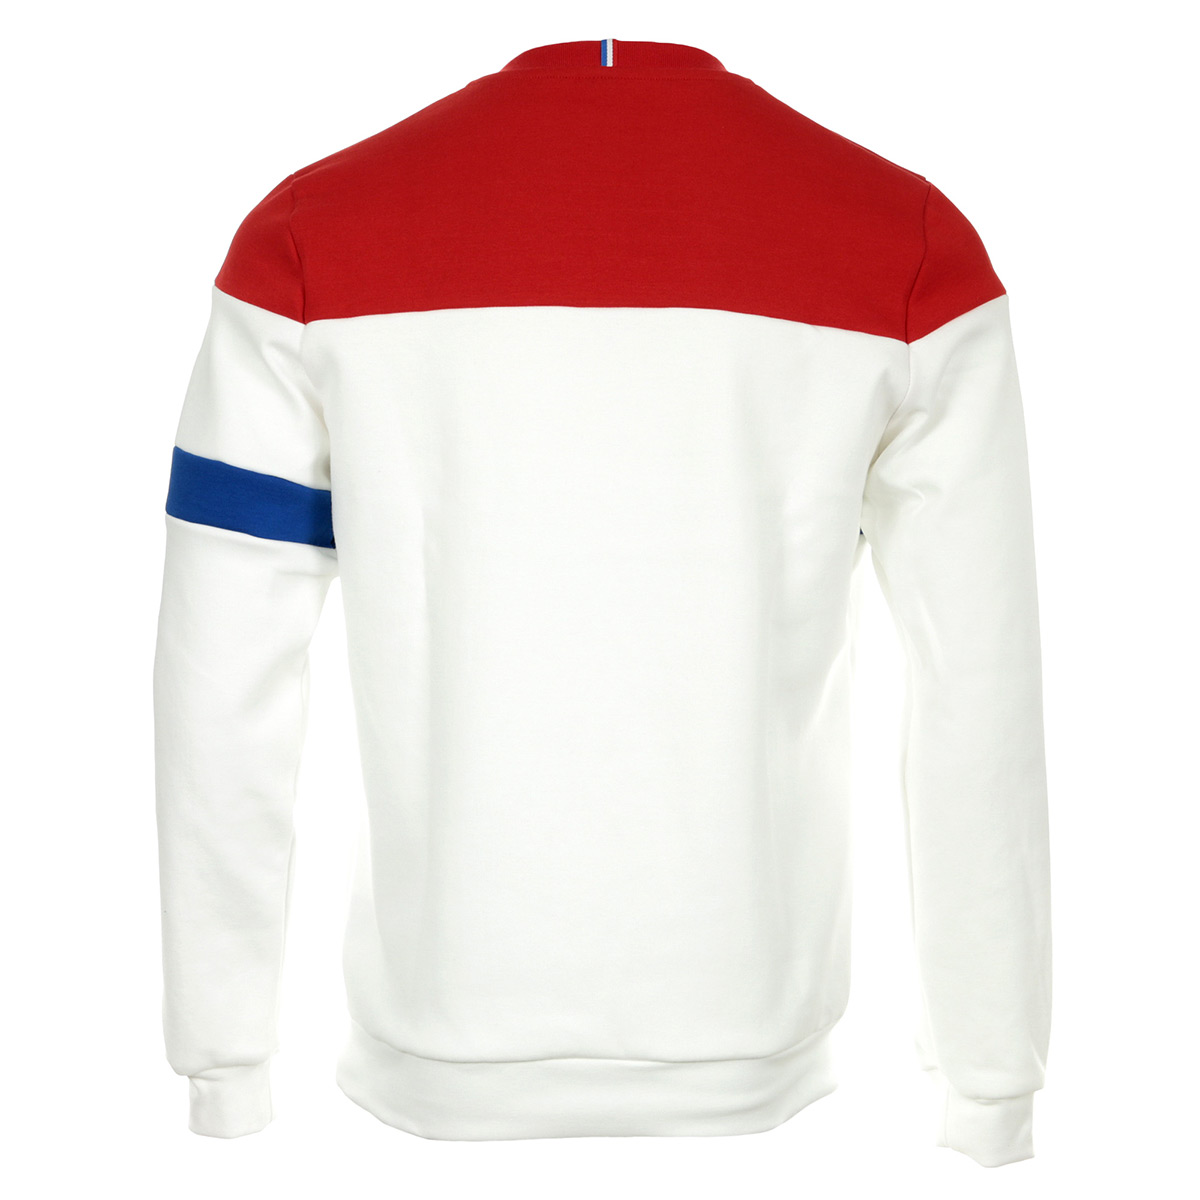 a9a218f312432 Le Coq Sportif Tri Crew Sweat 1920486, Sweats homme